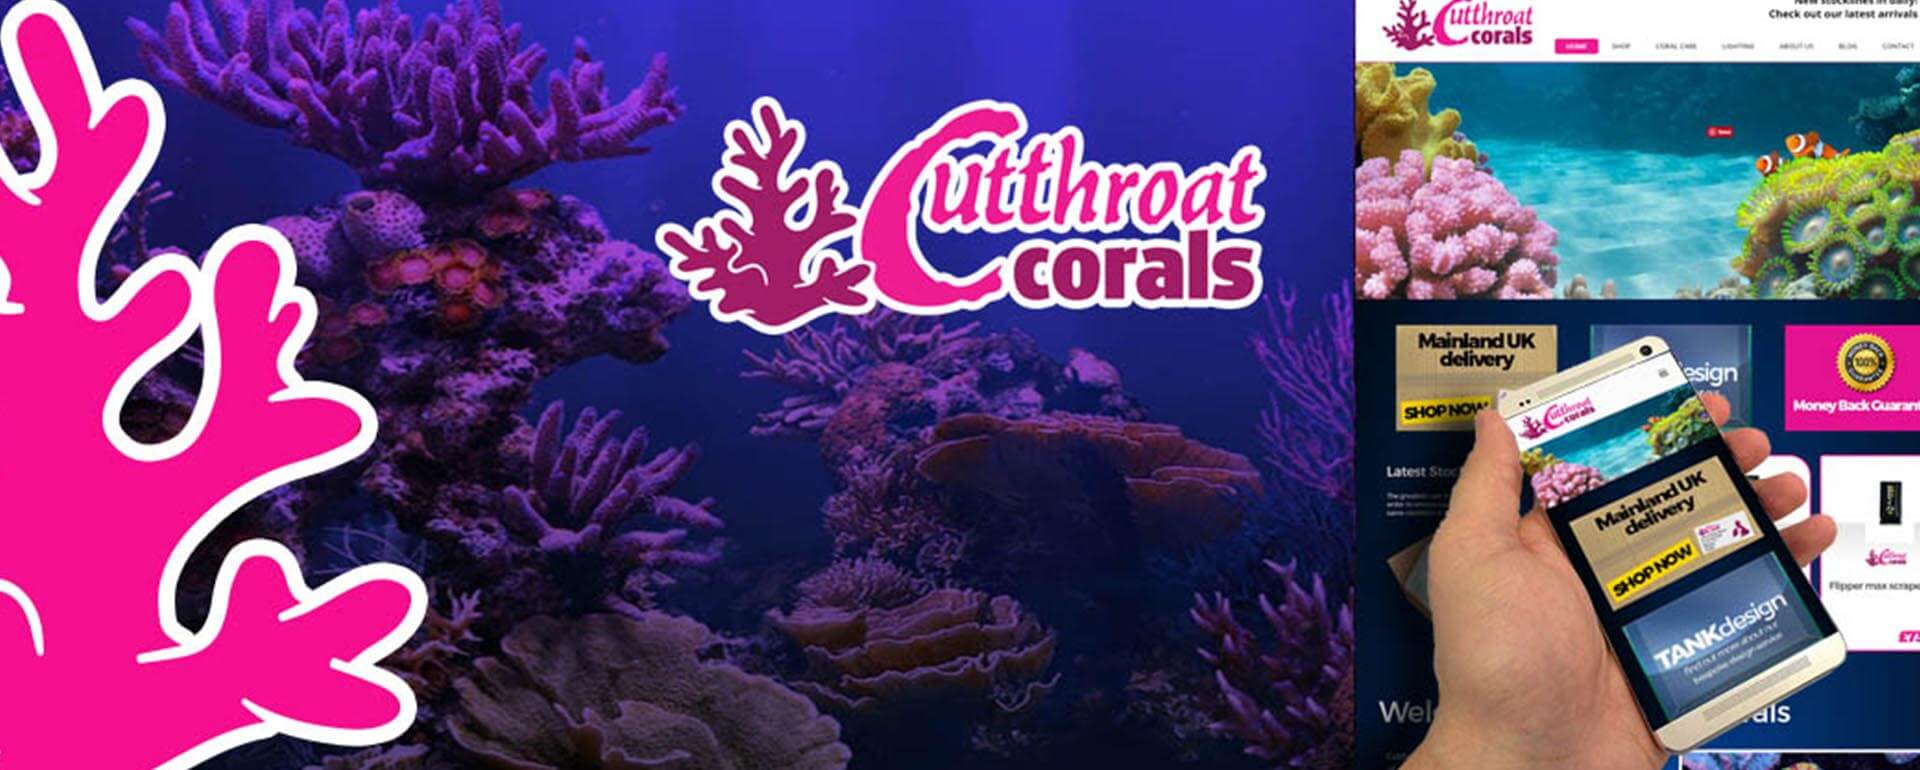 Cutthroat Corals New Web